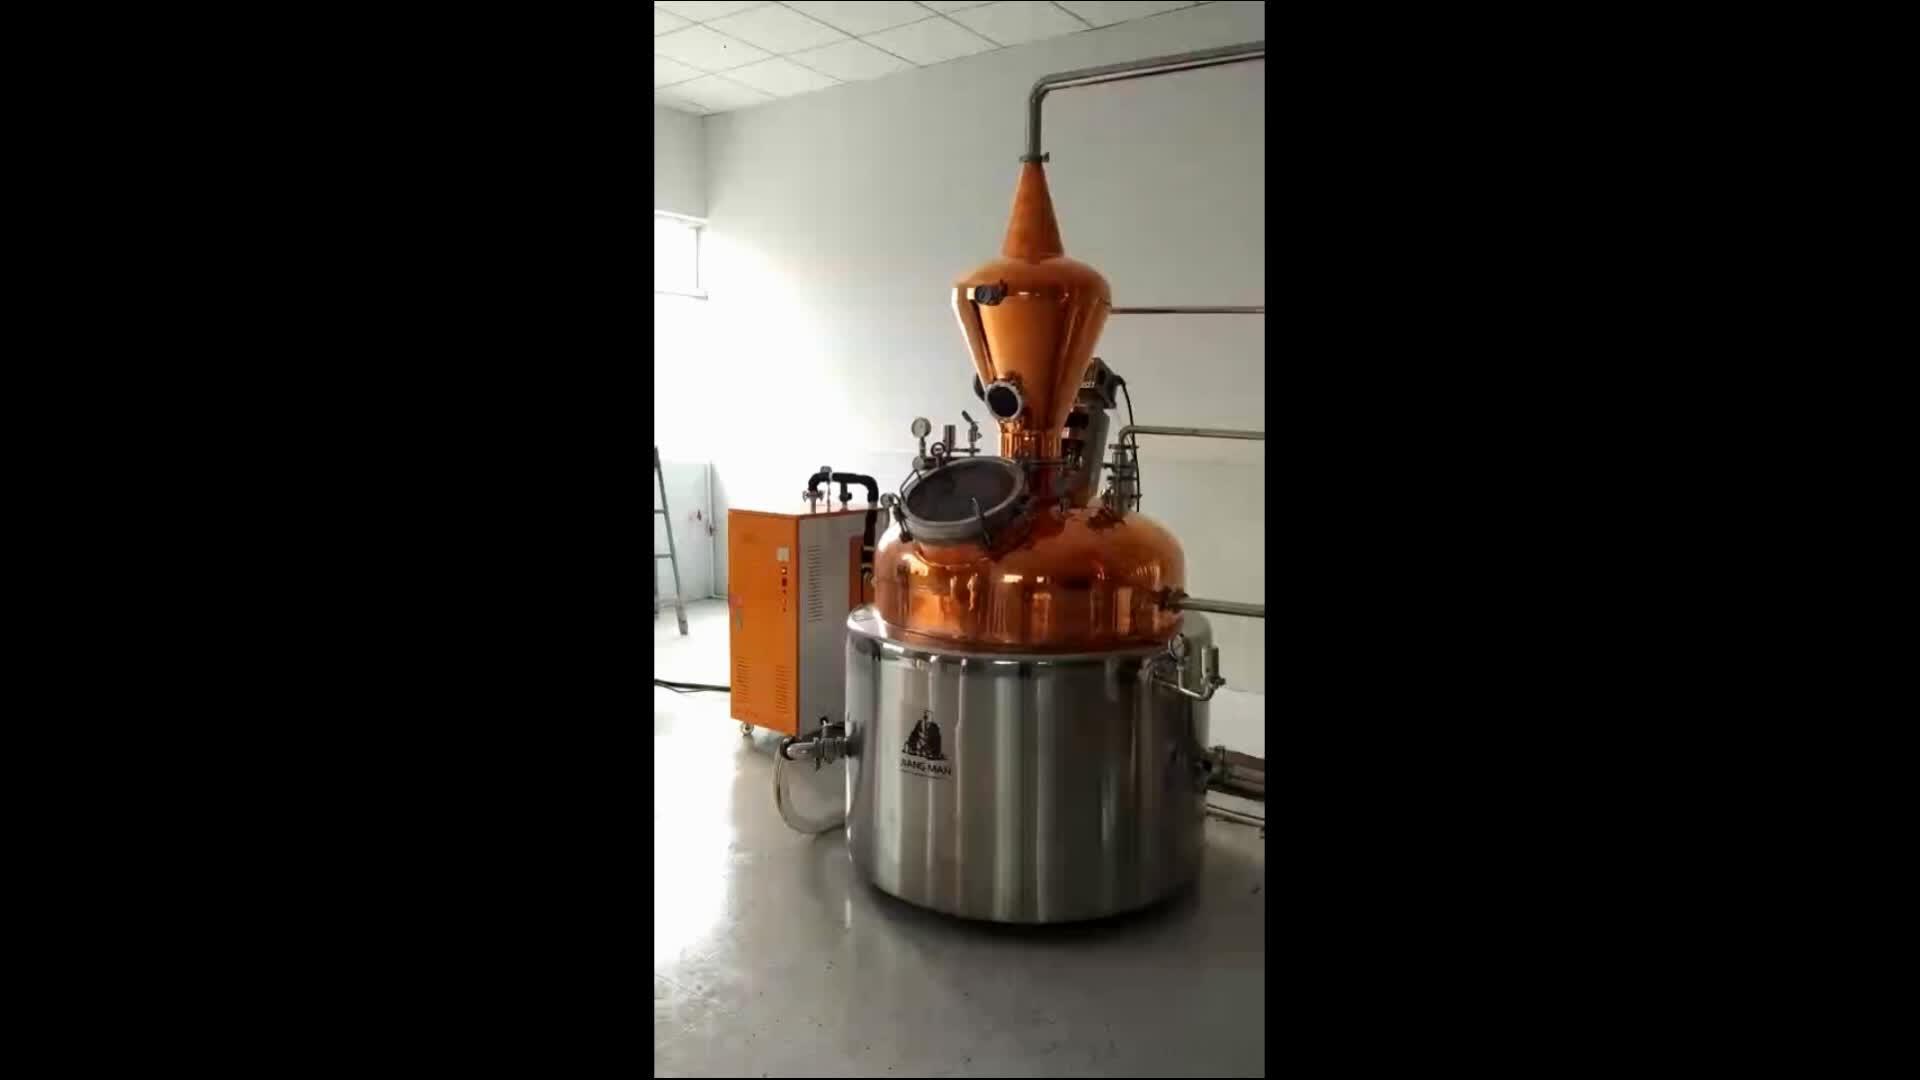 [JiangMan]-शराब प्रसंस्करण उपकरण 500L हाइब्रिड अभी भी 8 ''तांबे की प्लेट ग्लास भाटा आसवन स्तंभ वोदका/ जिन शराब खींचनेवाला